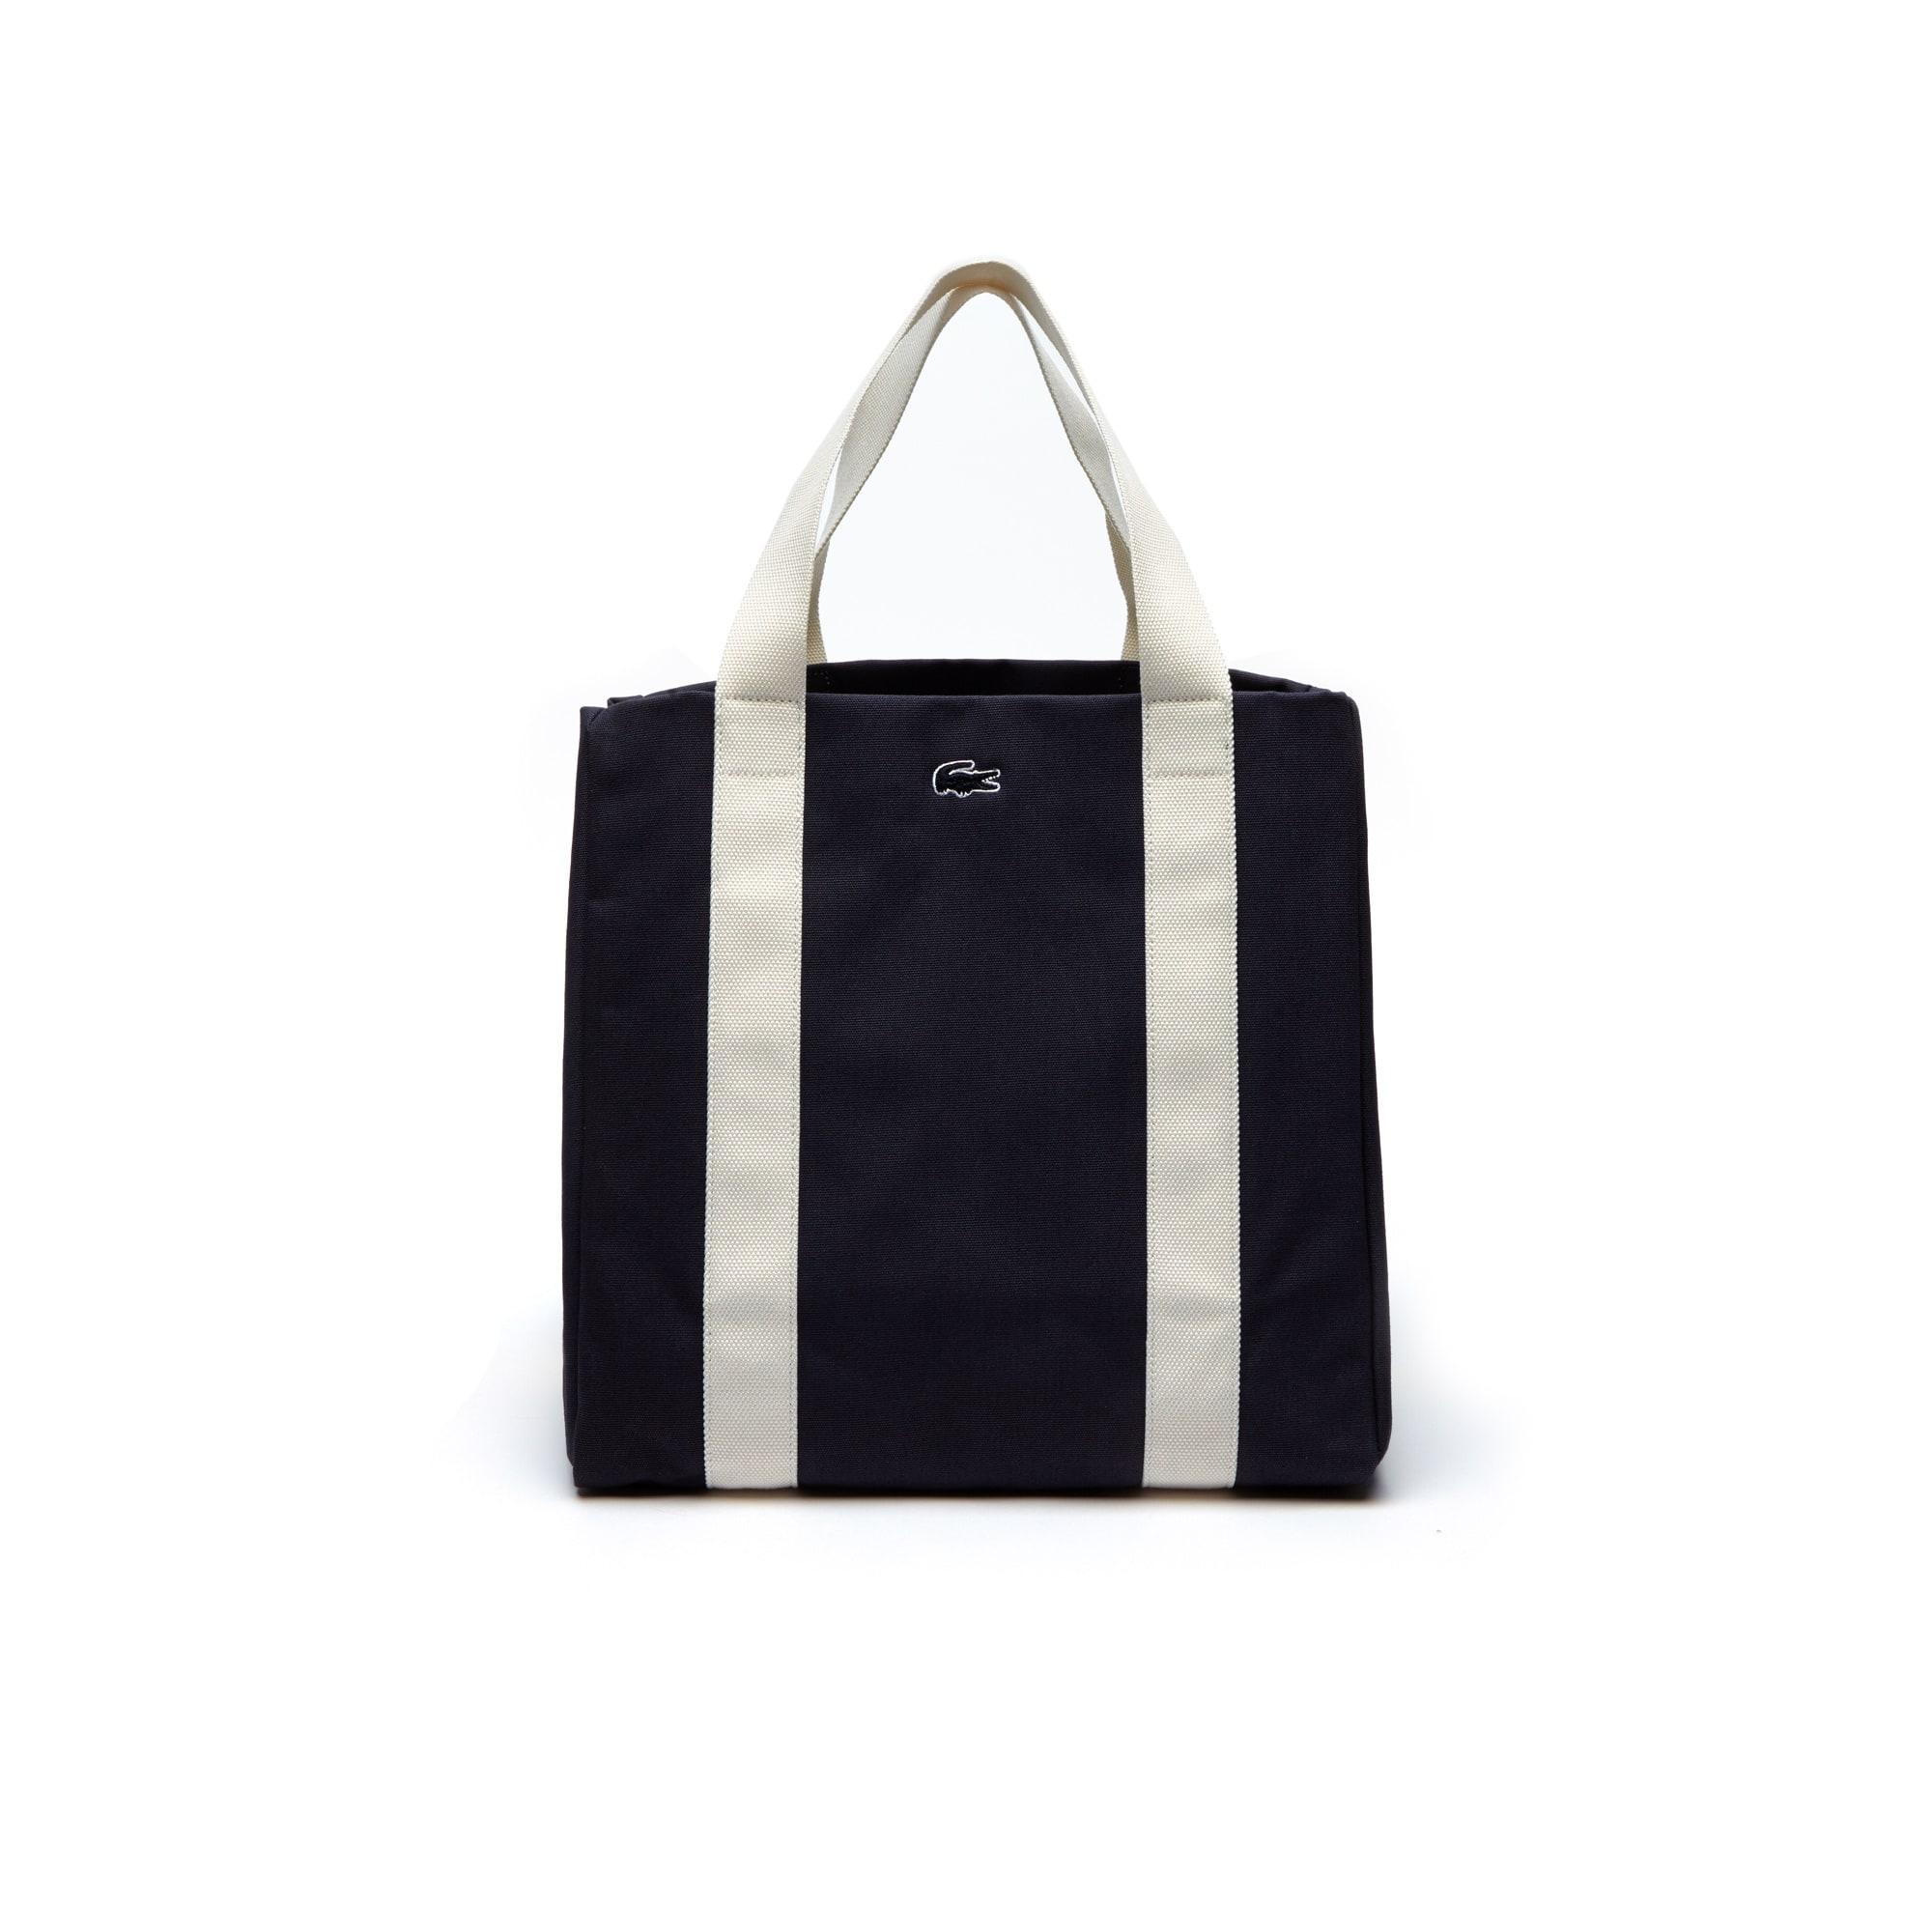 Damen Summer Colorblock - große erweiterbare Baumwoll-Tote Bag